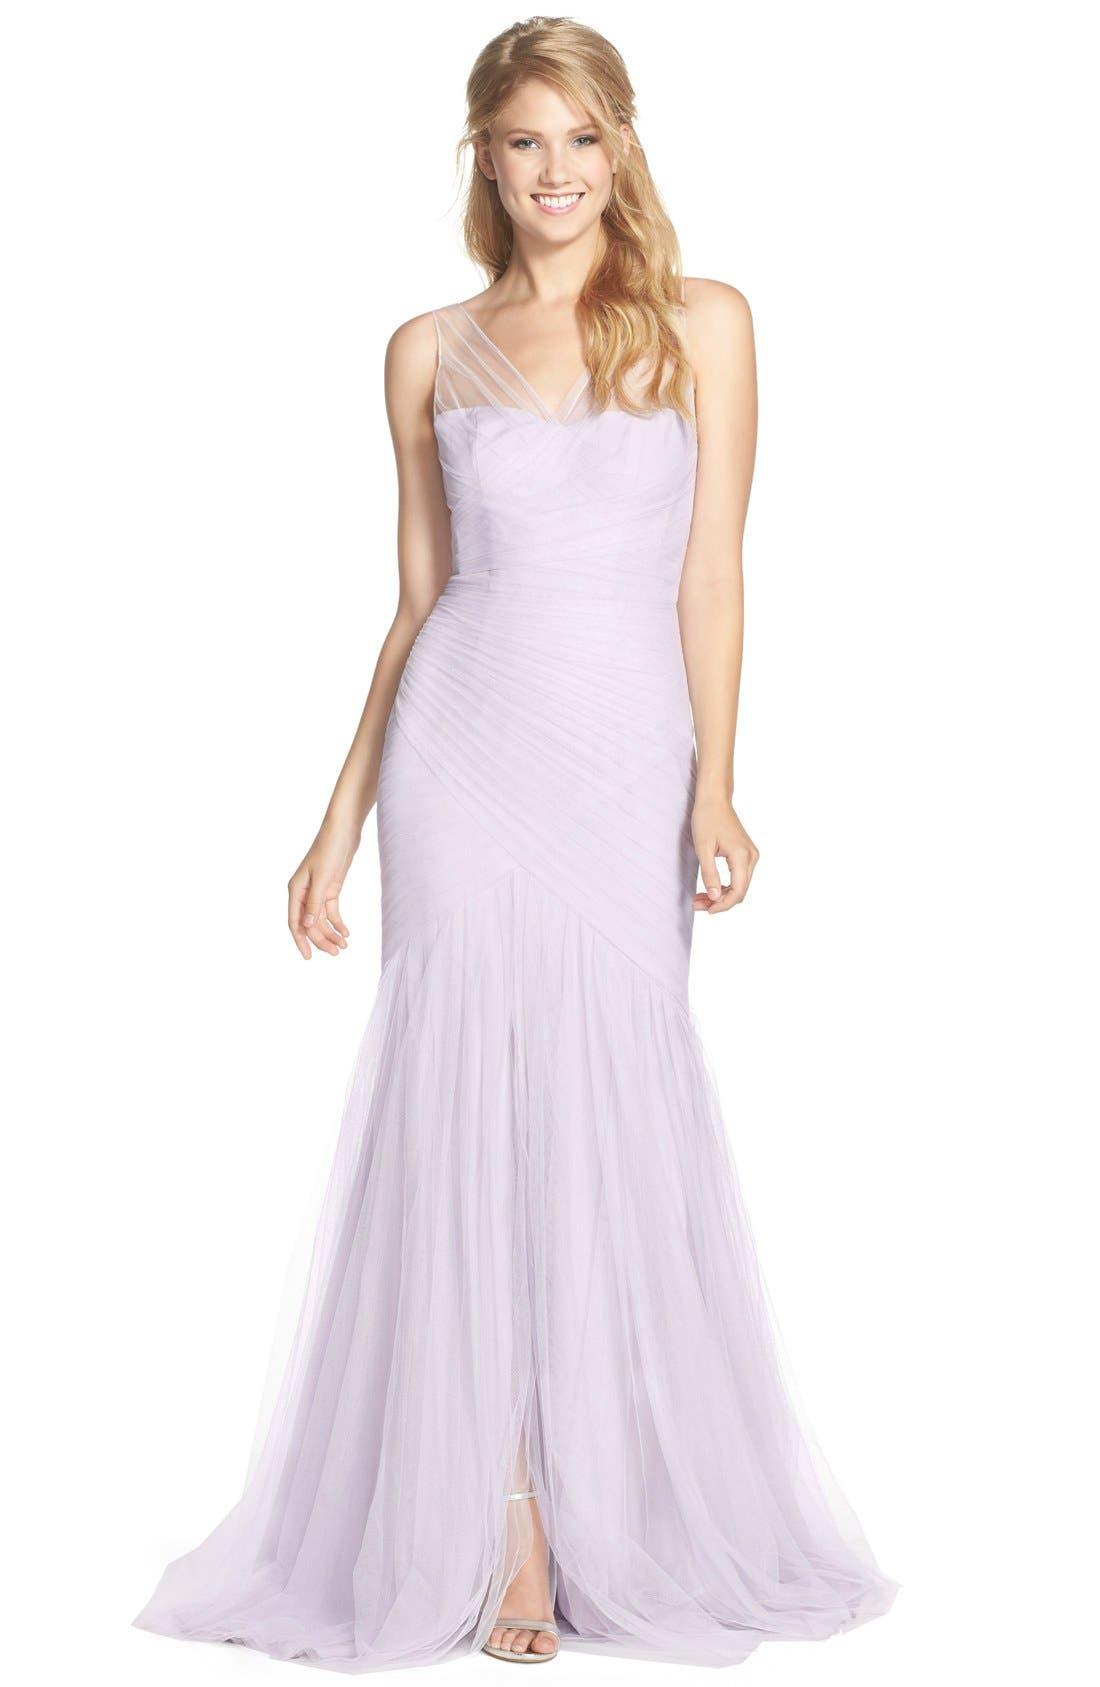 Alternate Image 1 Selected - Monique Lhuillier Bridesmaids Illusion Yoke Pleat Tulle Trumpet Gown